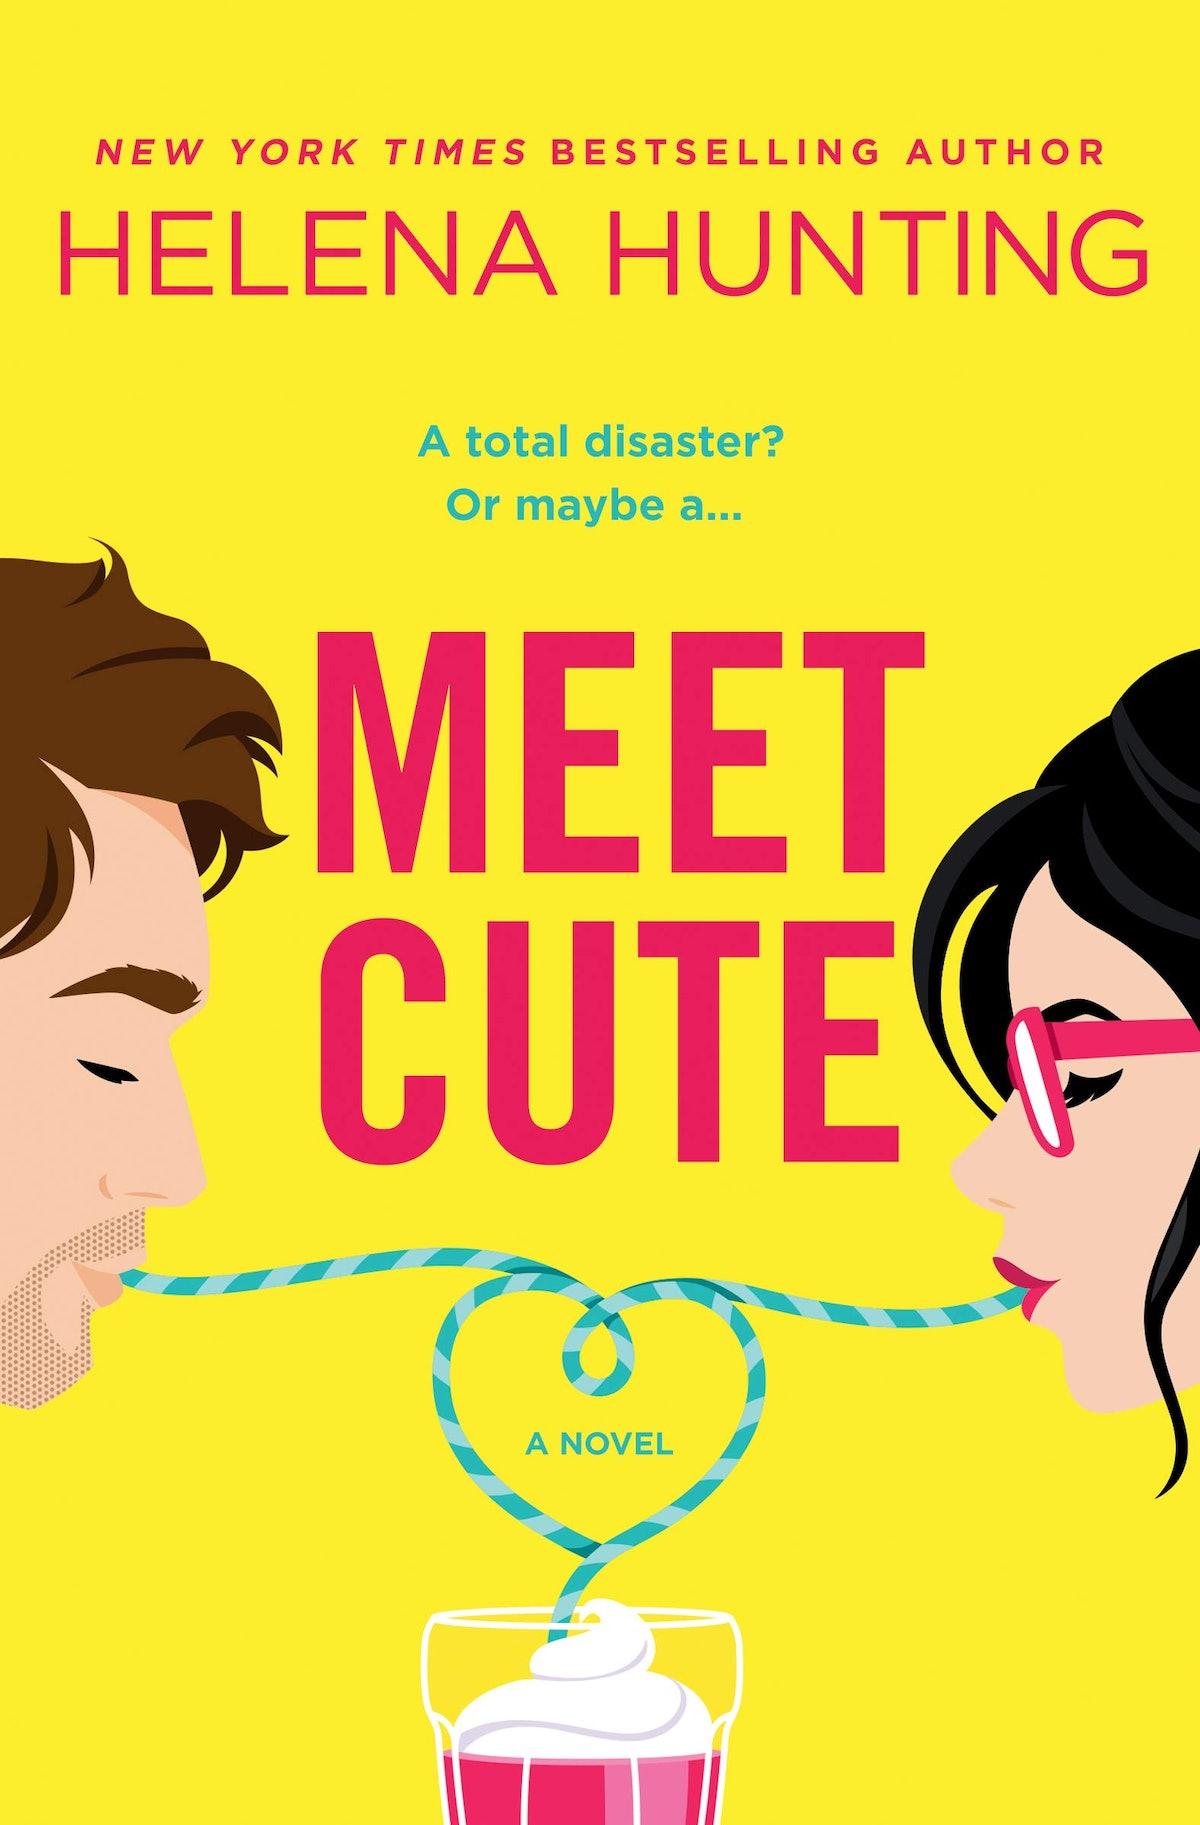 'Meet Cute' by Helena Hunting